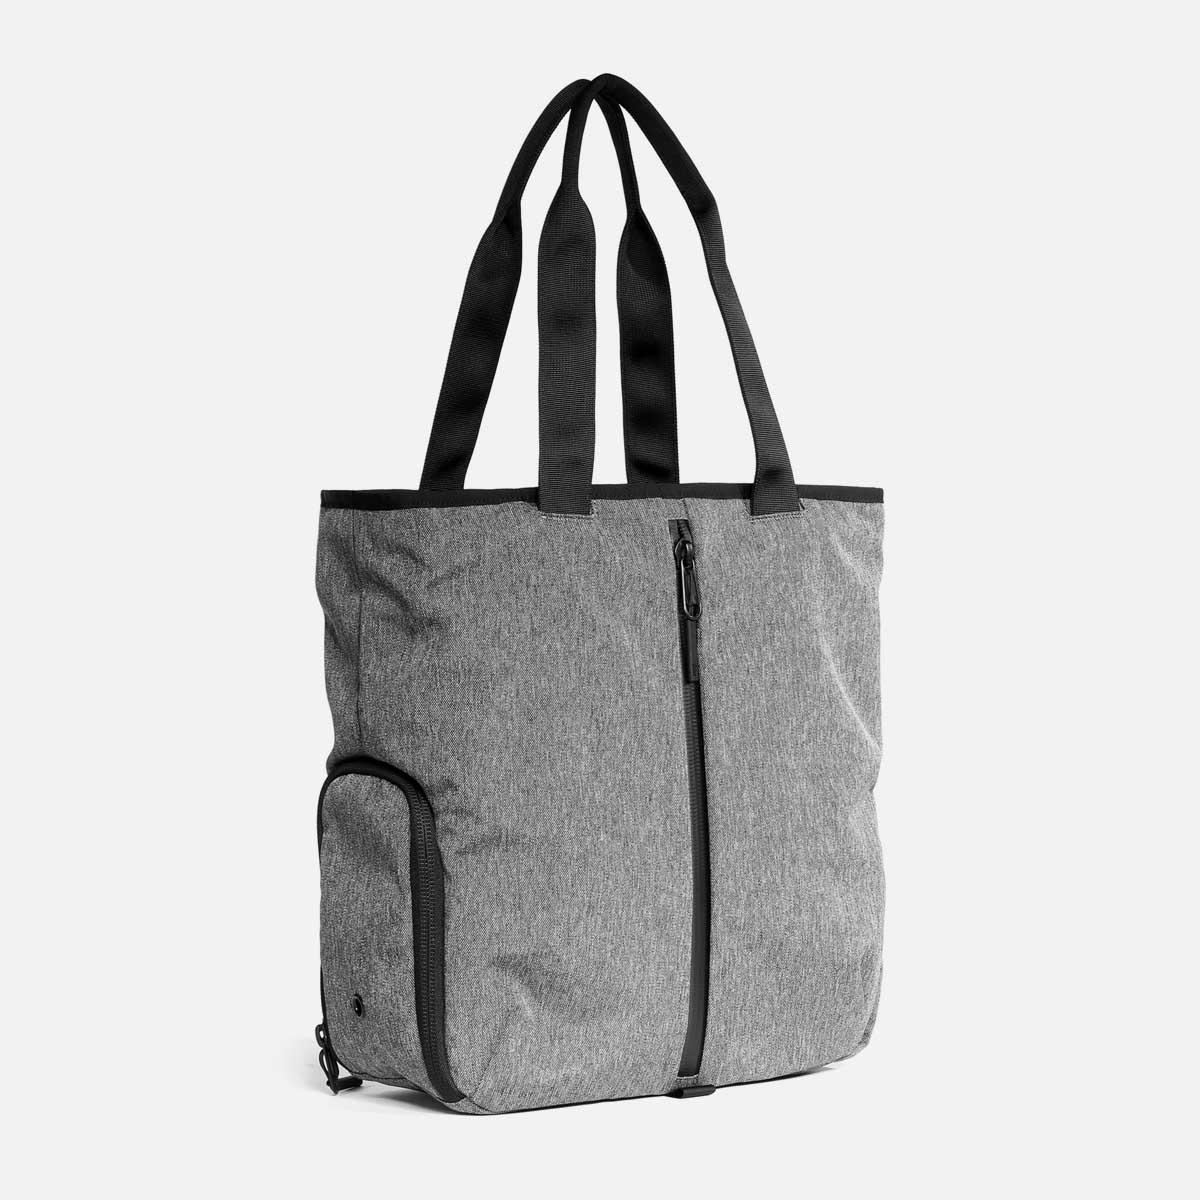 Gym Tote Gray Aer Modern Bags Travel Backpacks